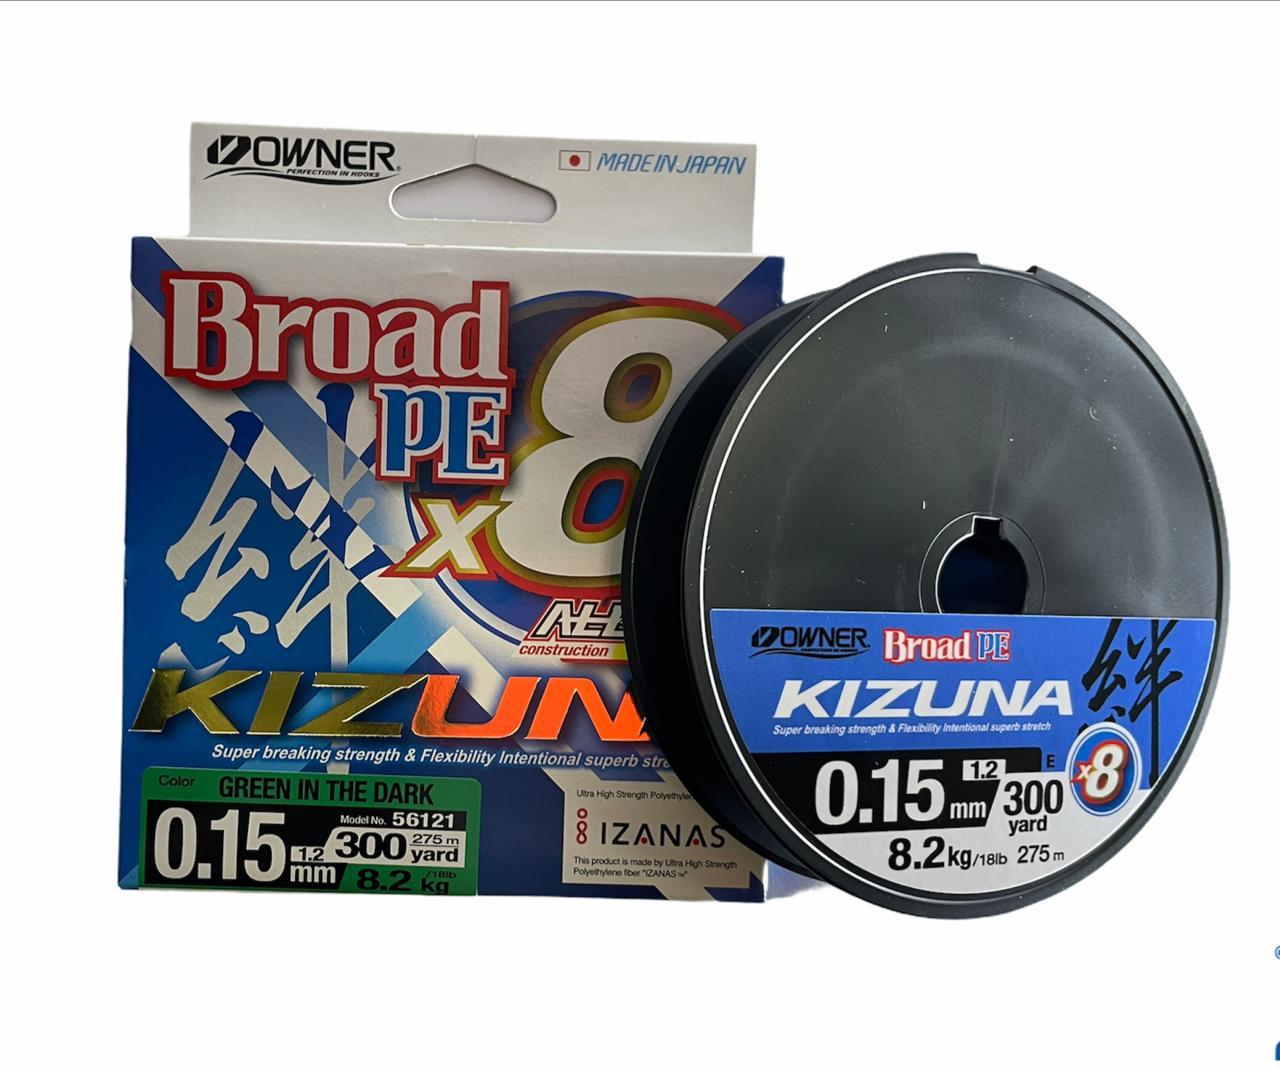 Owner kizuna Broad PE X8 0.15 8.2kg 275m (verde oscuro)